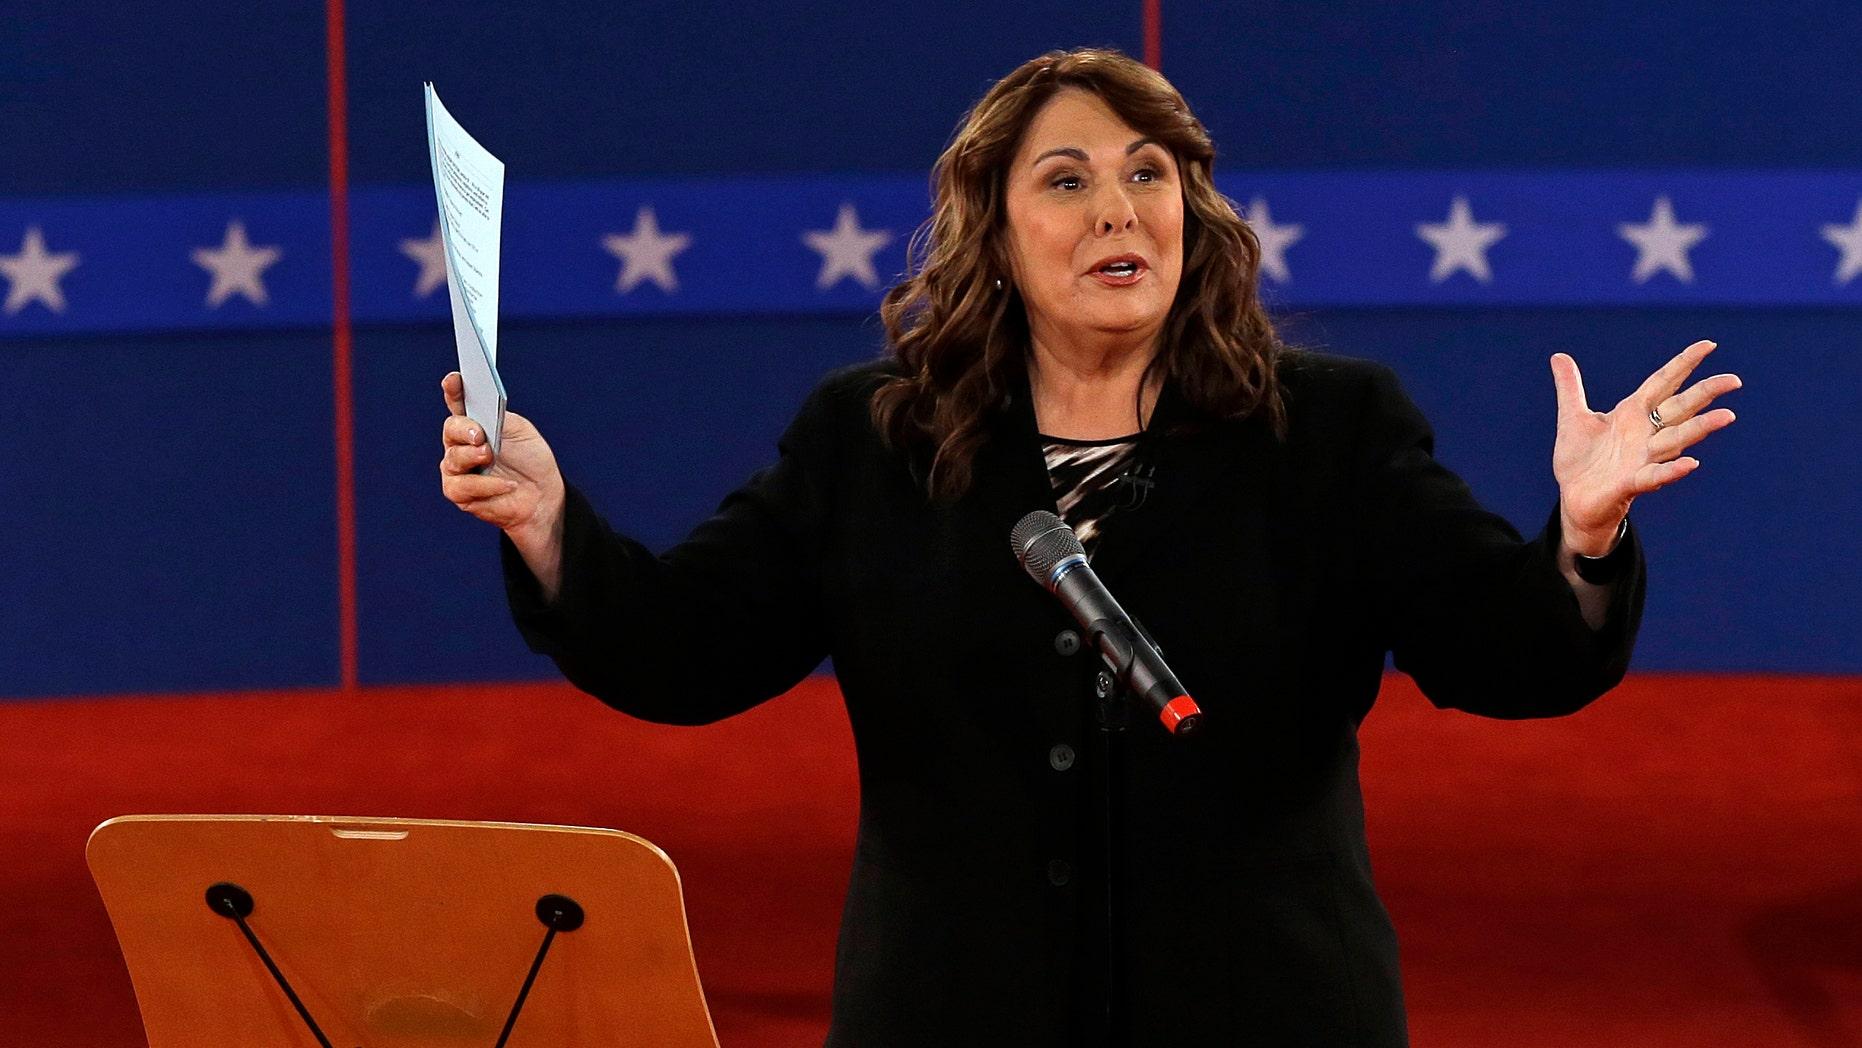 Oct. 16, 2012. Candy Crowley talks to the audience before the second presidential debate at Hofstra University, in Hempstead, N.Y.